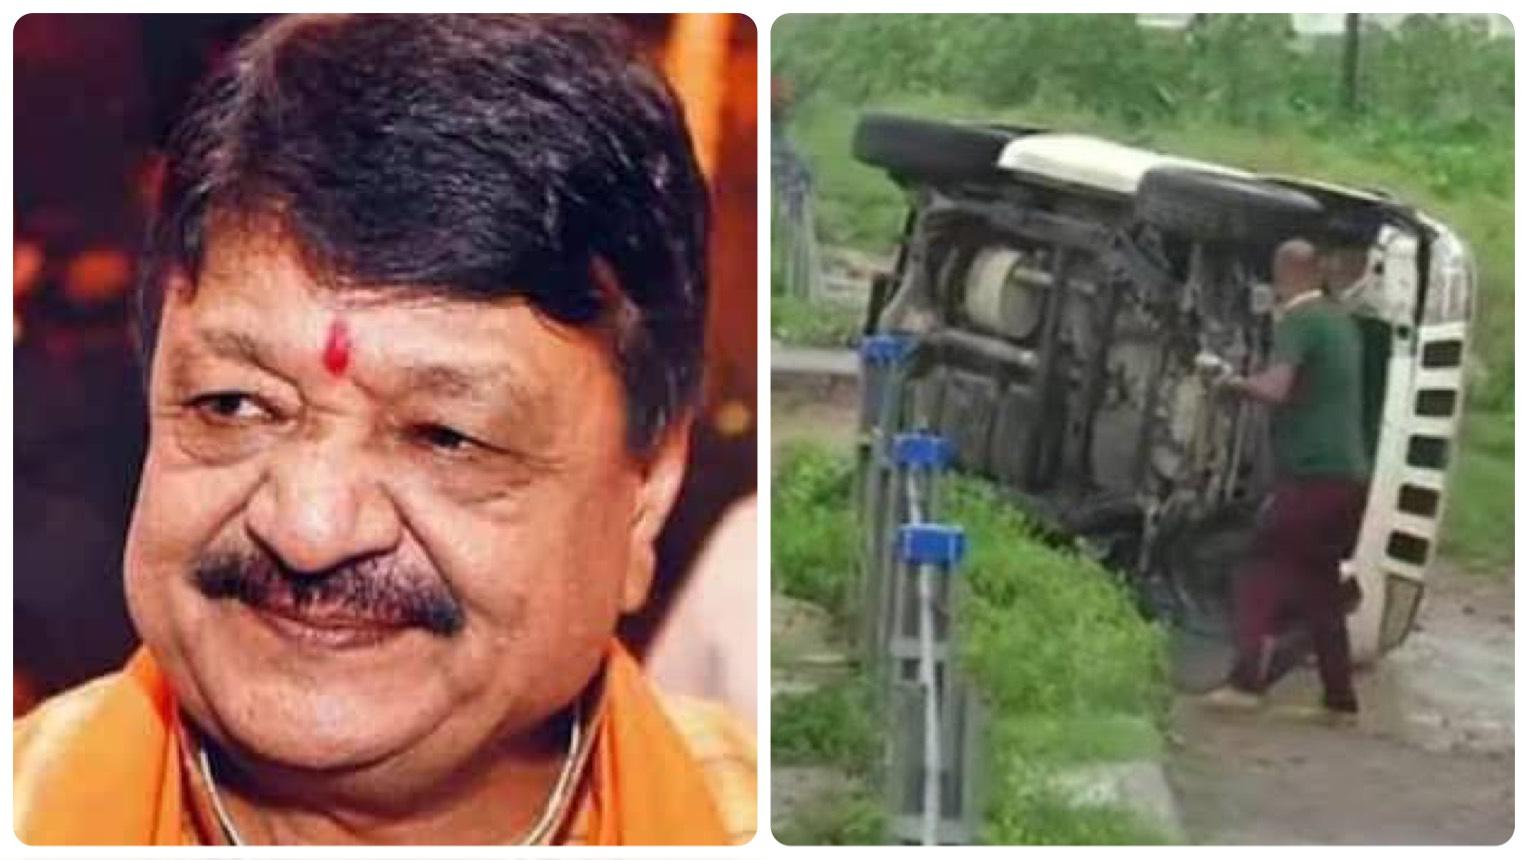 'In Yogi Adityanath's state, sometimes police cars carrying culprits overturn': BJP Leader Kailash Vijayvargiya on Hathras case